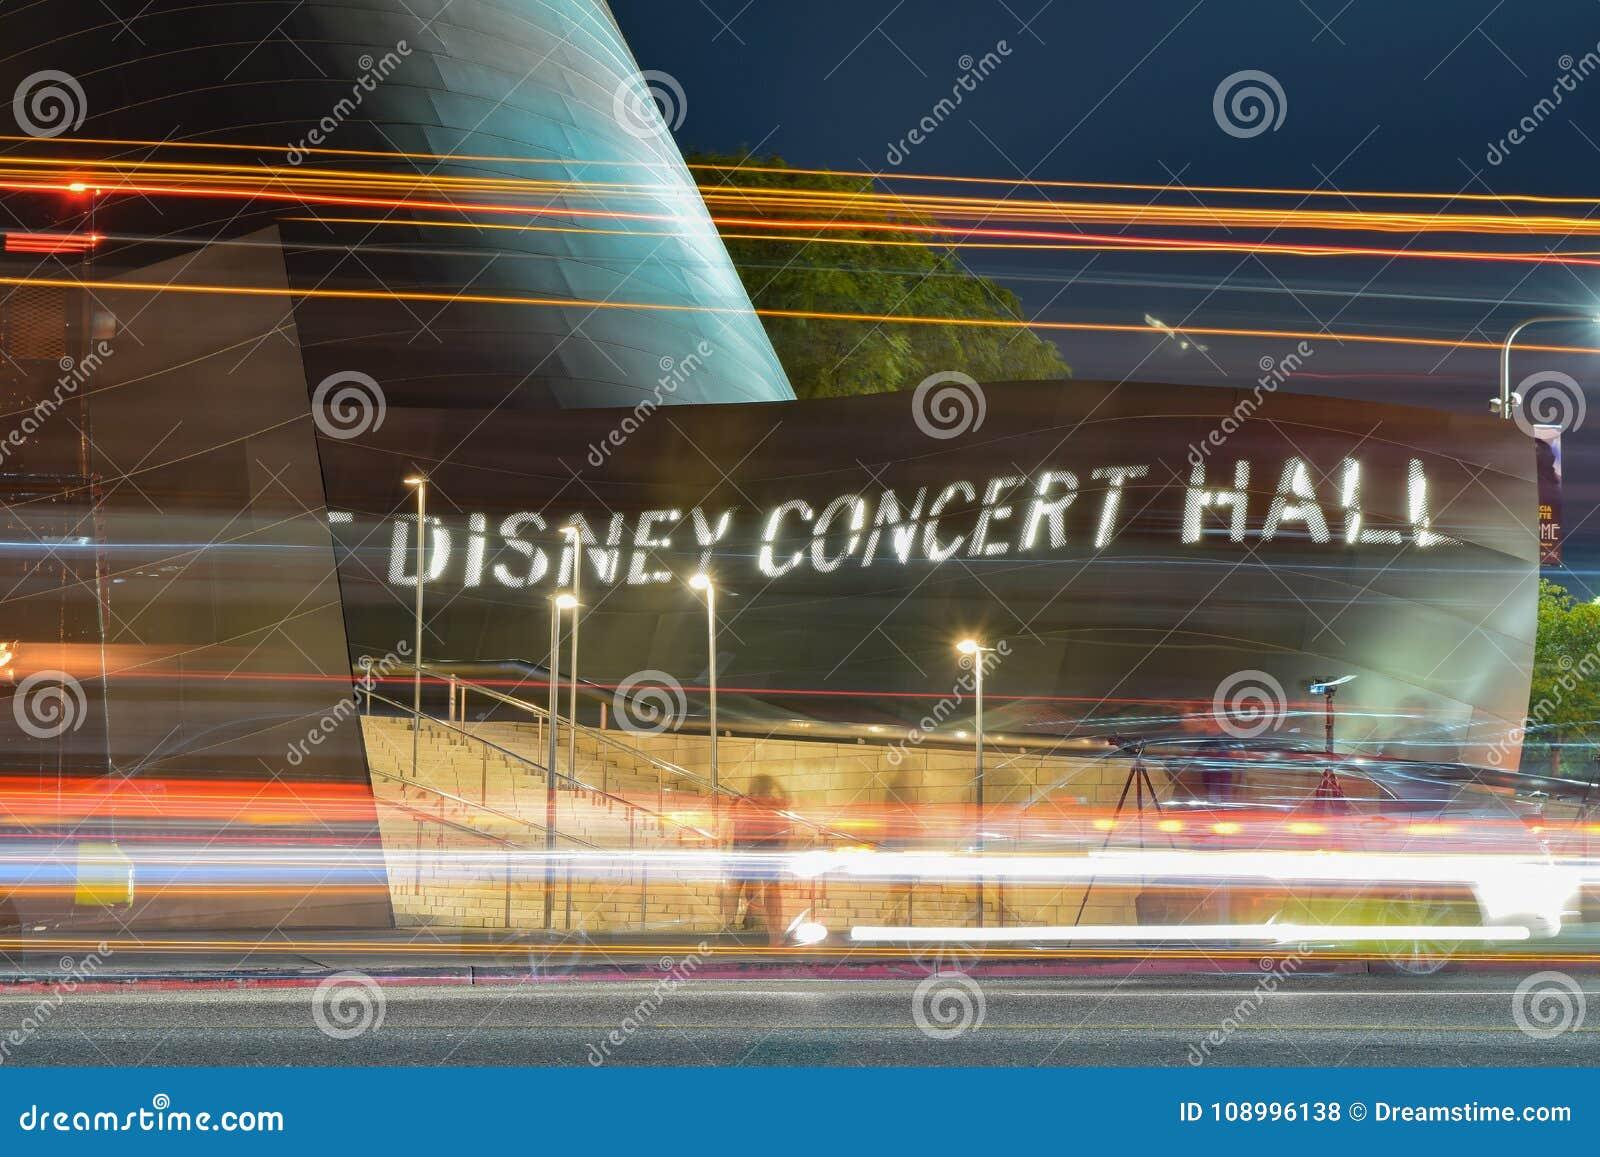 Disney Concert Hall - A long exposure look